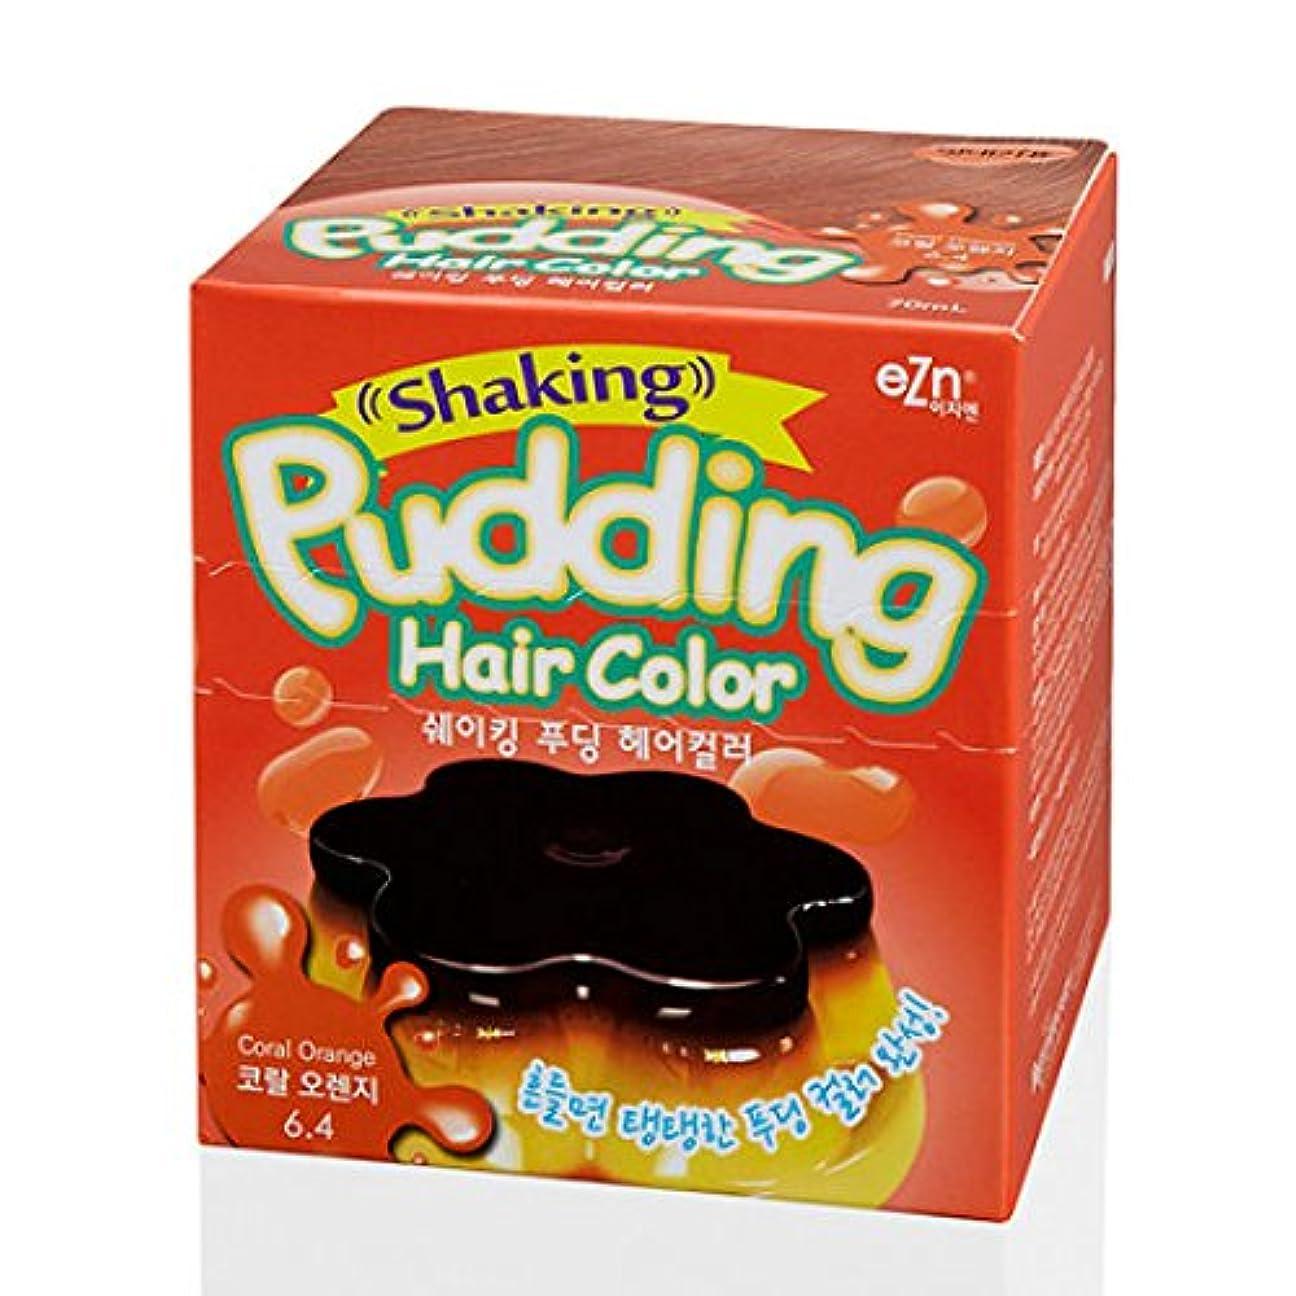 KOREA NO.1 毛染め(hair dyeing) shaking pudding hair color (coral orange) [並行輸入品]